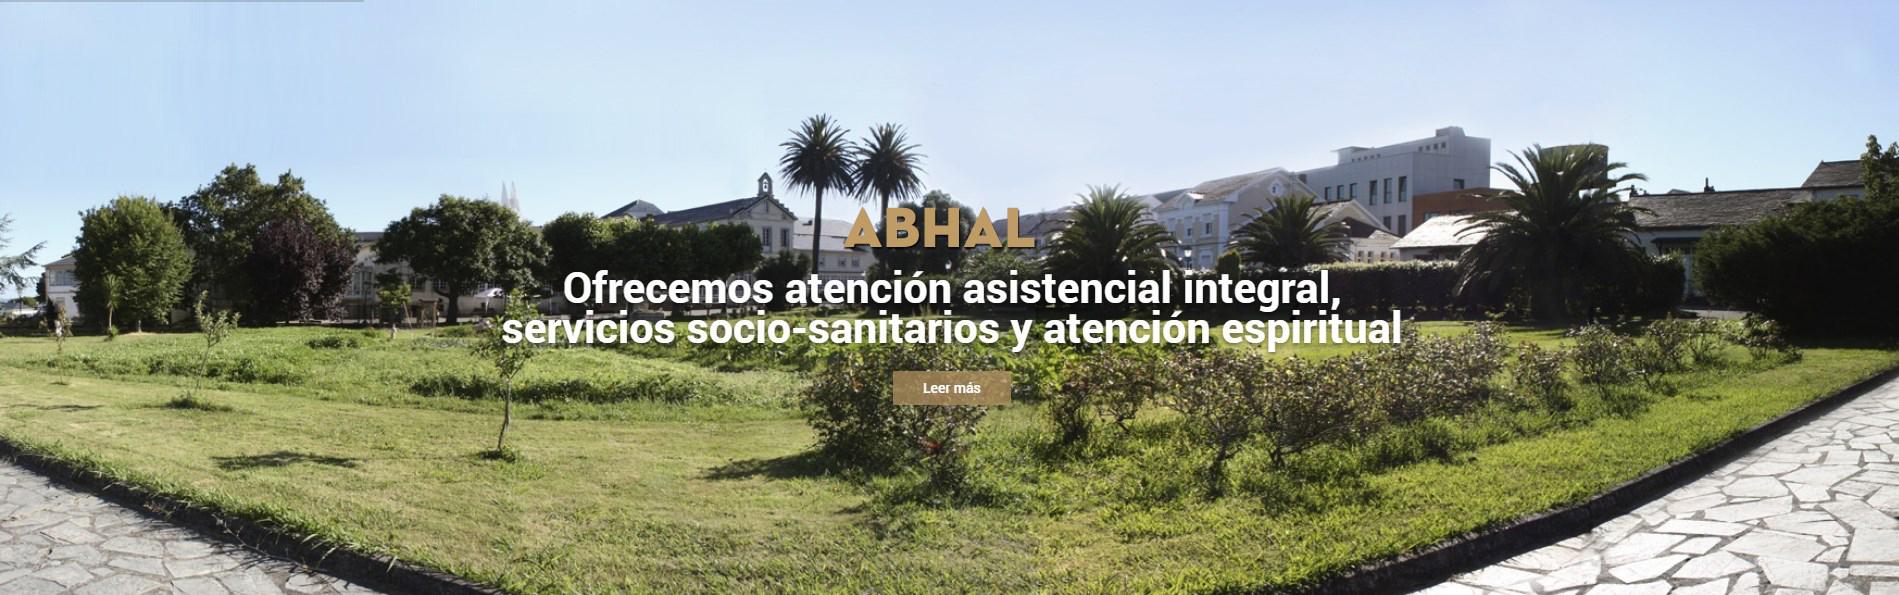 Jardines de Asociación Benéfica Hospital Asilo de Luarca